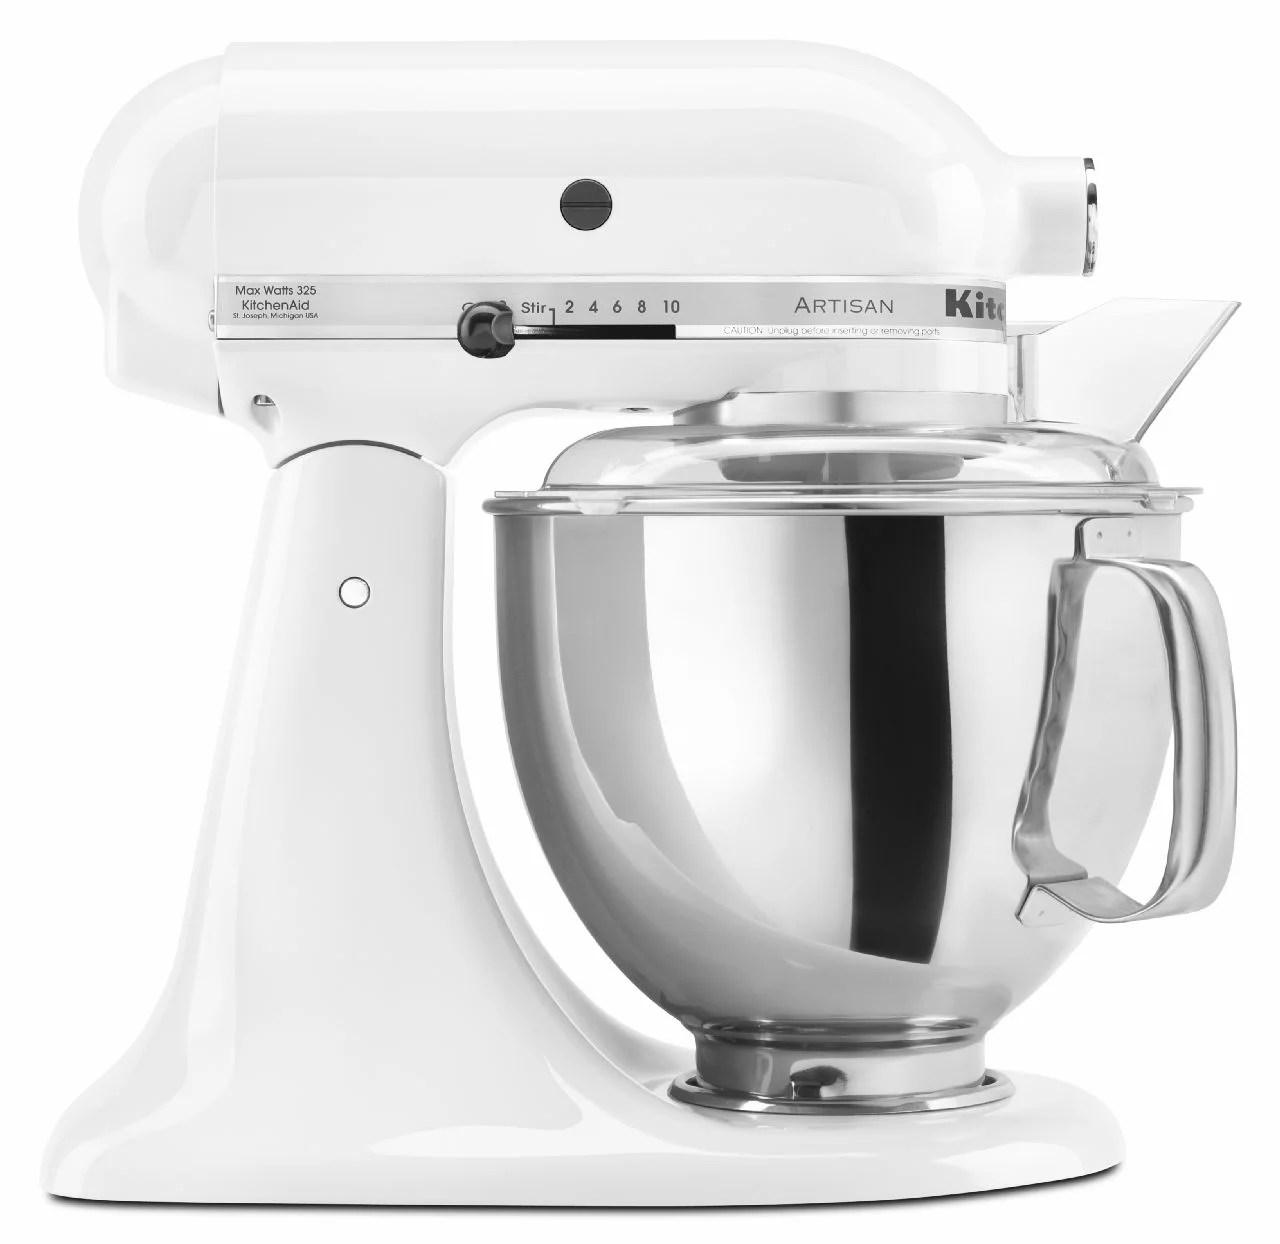 kitchenaid artisan series 5 quart tilt head stand mixer white ksm150pswh walmart com